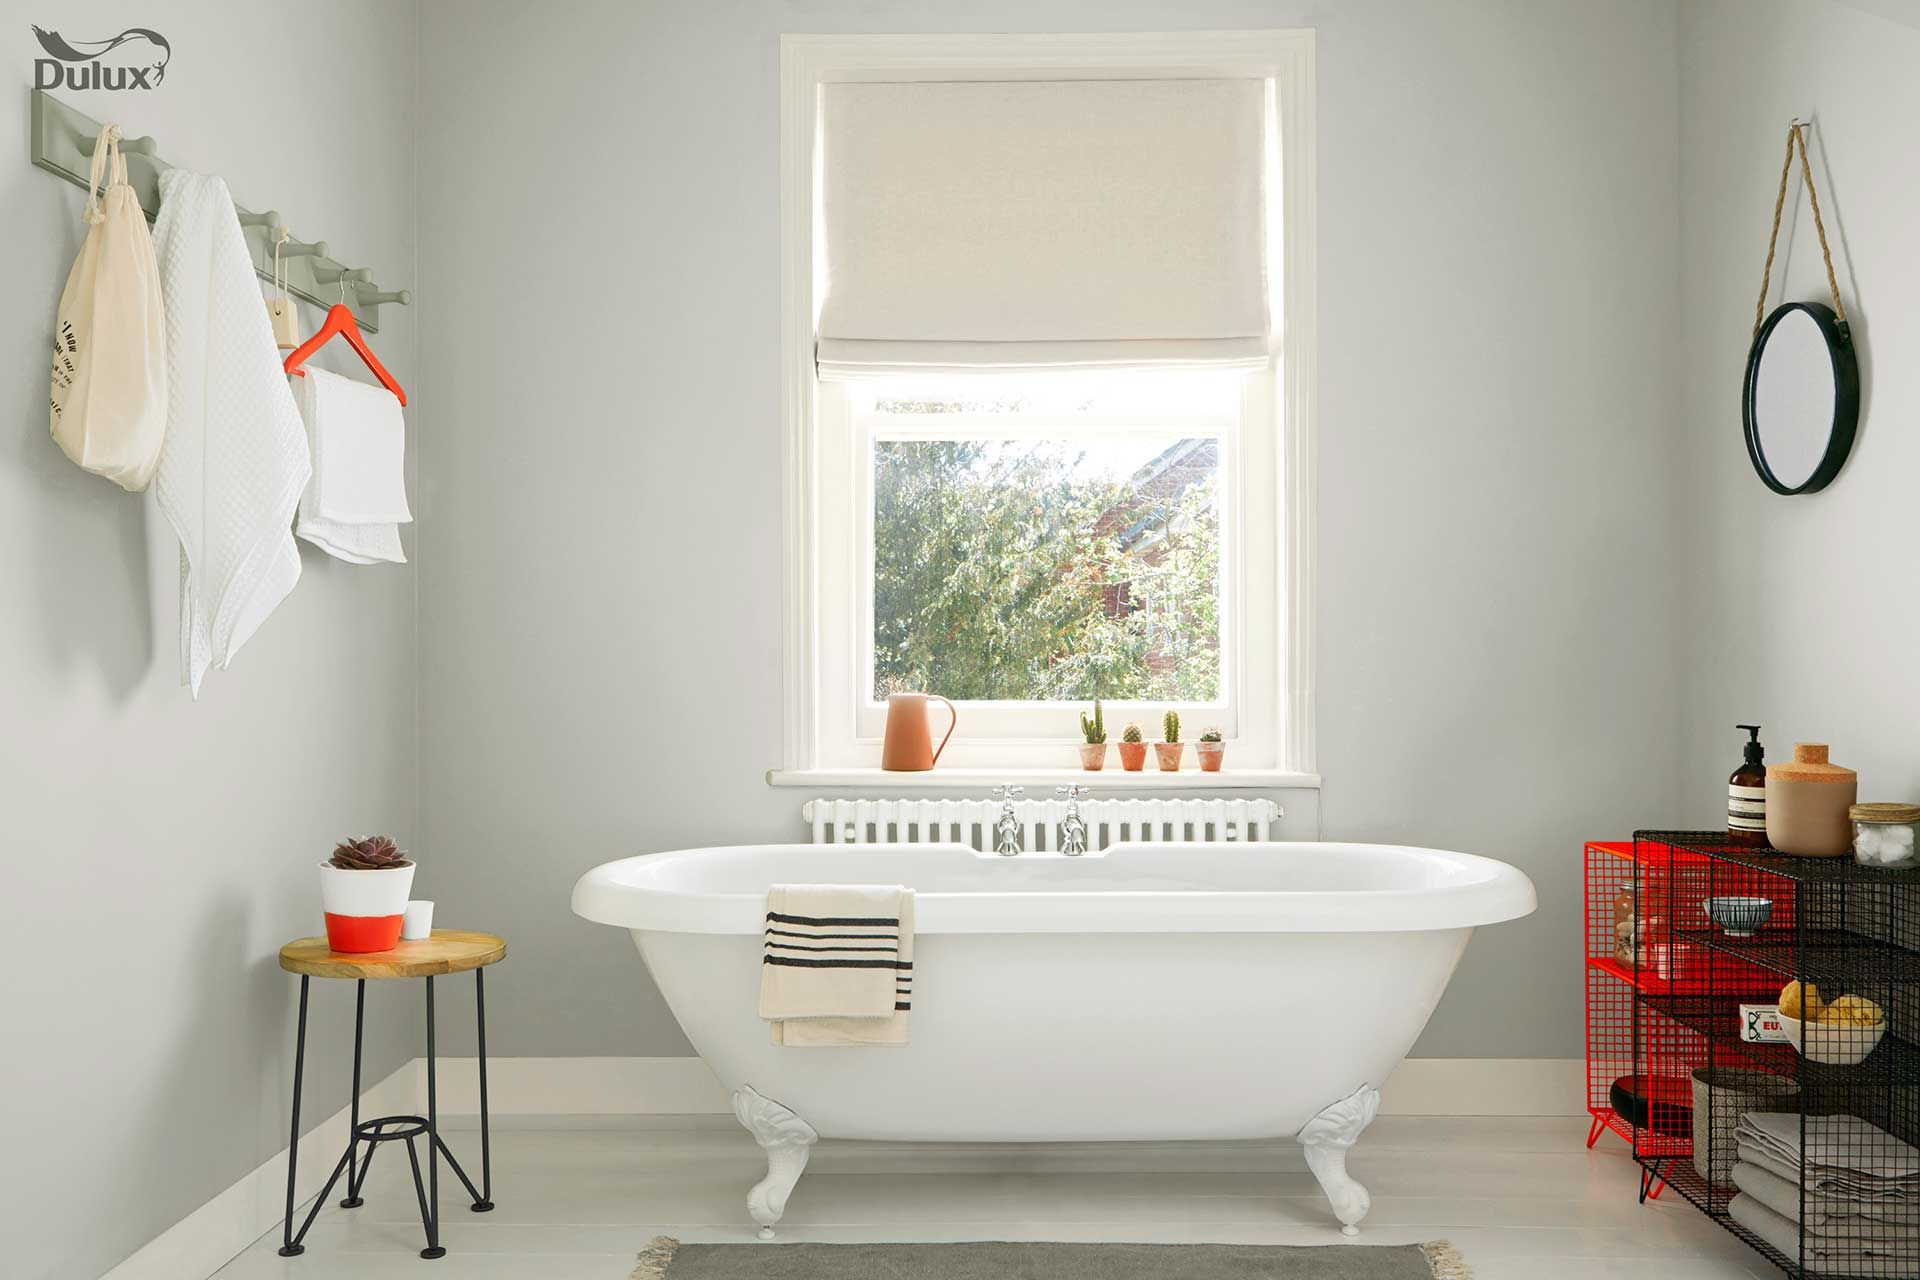 Dulux Polished Pebble Tester, 30ml | Bath accommodation ...